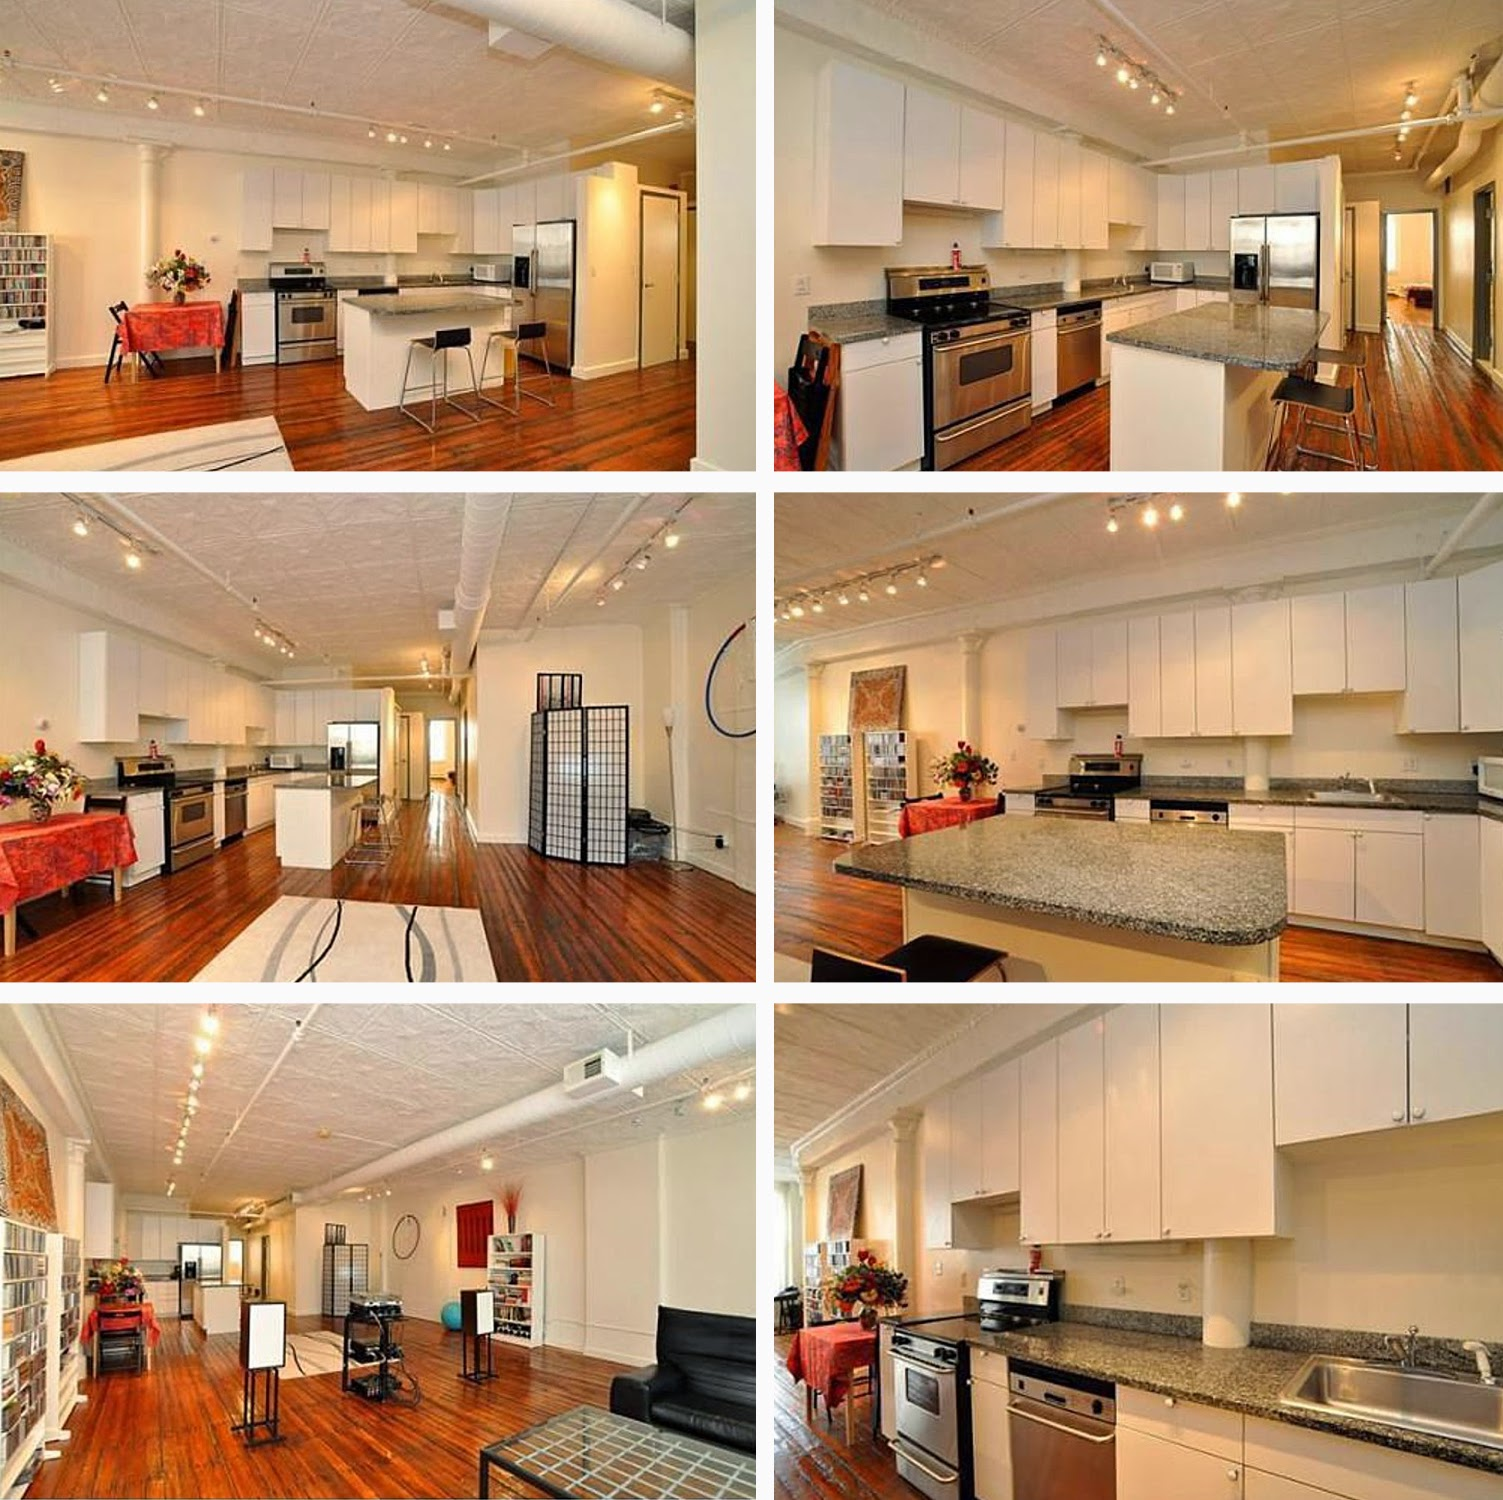 sabbe interior design the blog a leather district kitchen